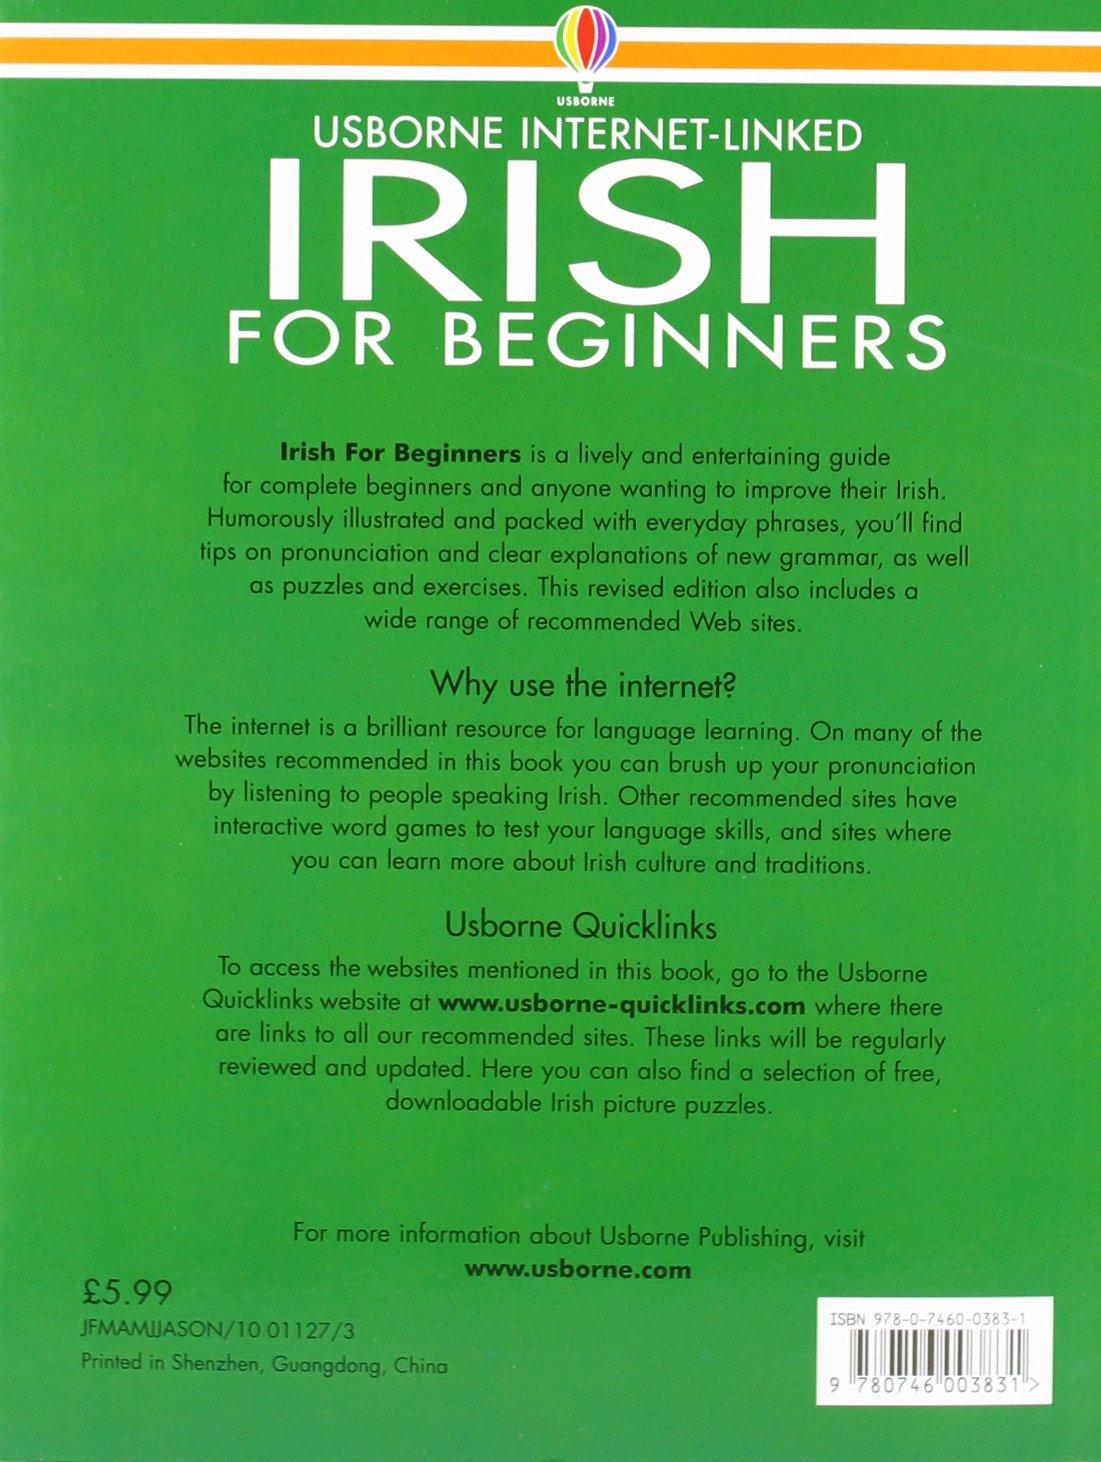 Workbooks english grammar workbook for dummies pdf free download : Irish for Beginners Usborne Language Guide (Language for Beginners ...